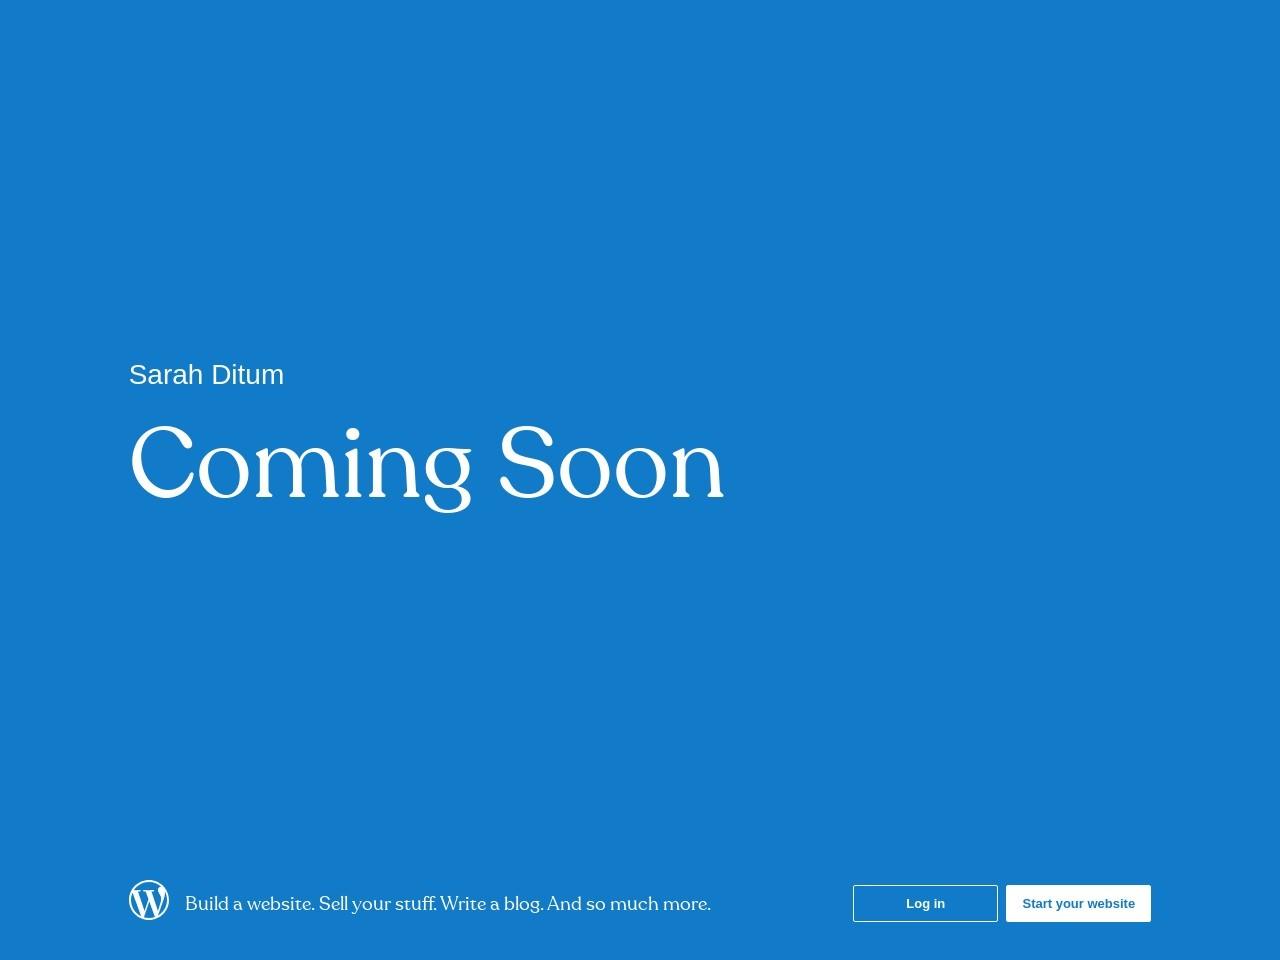 Writing/listening | Sarah Ditum